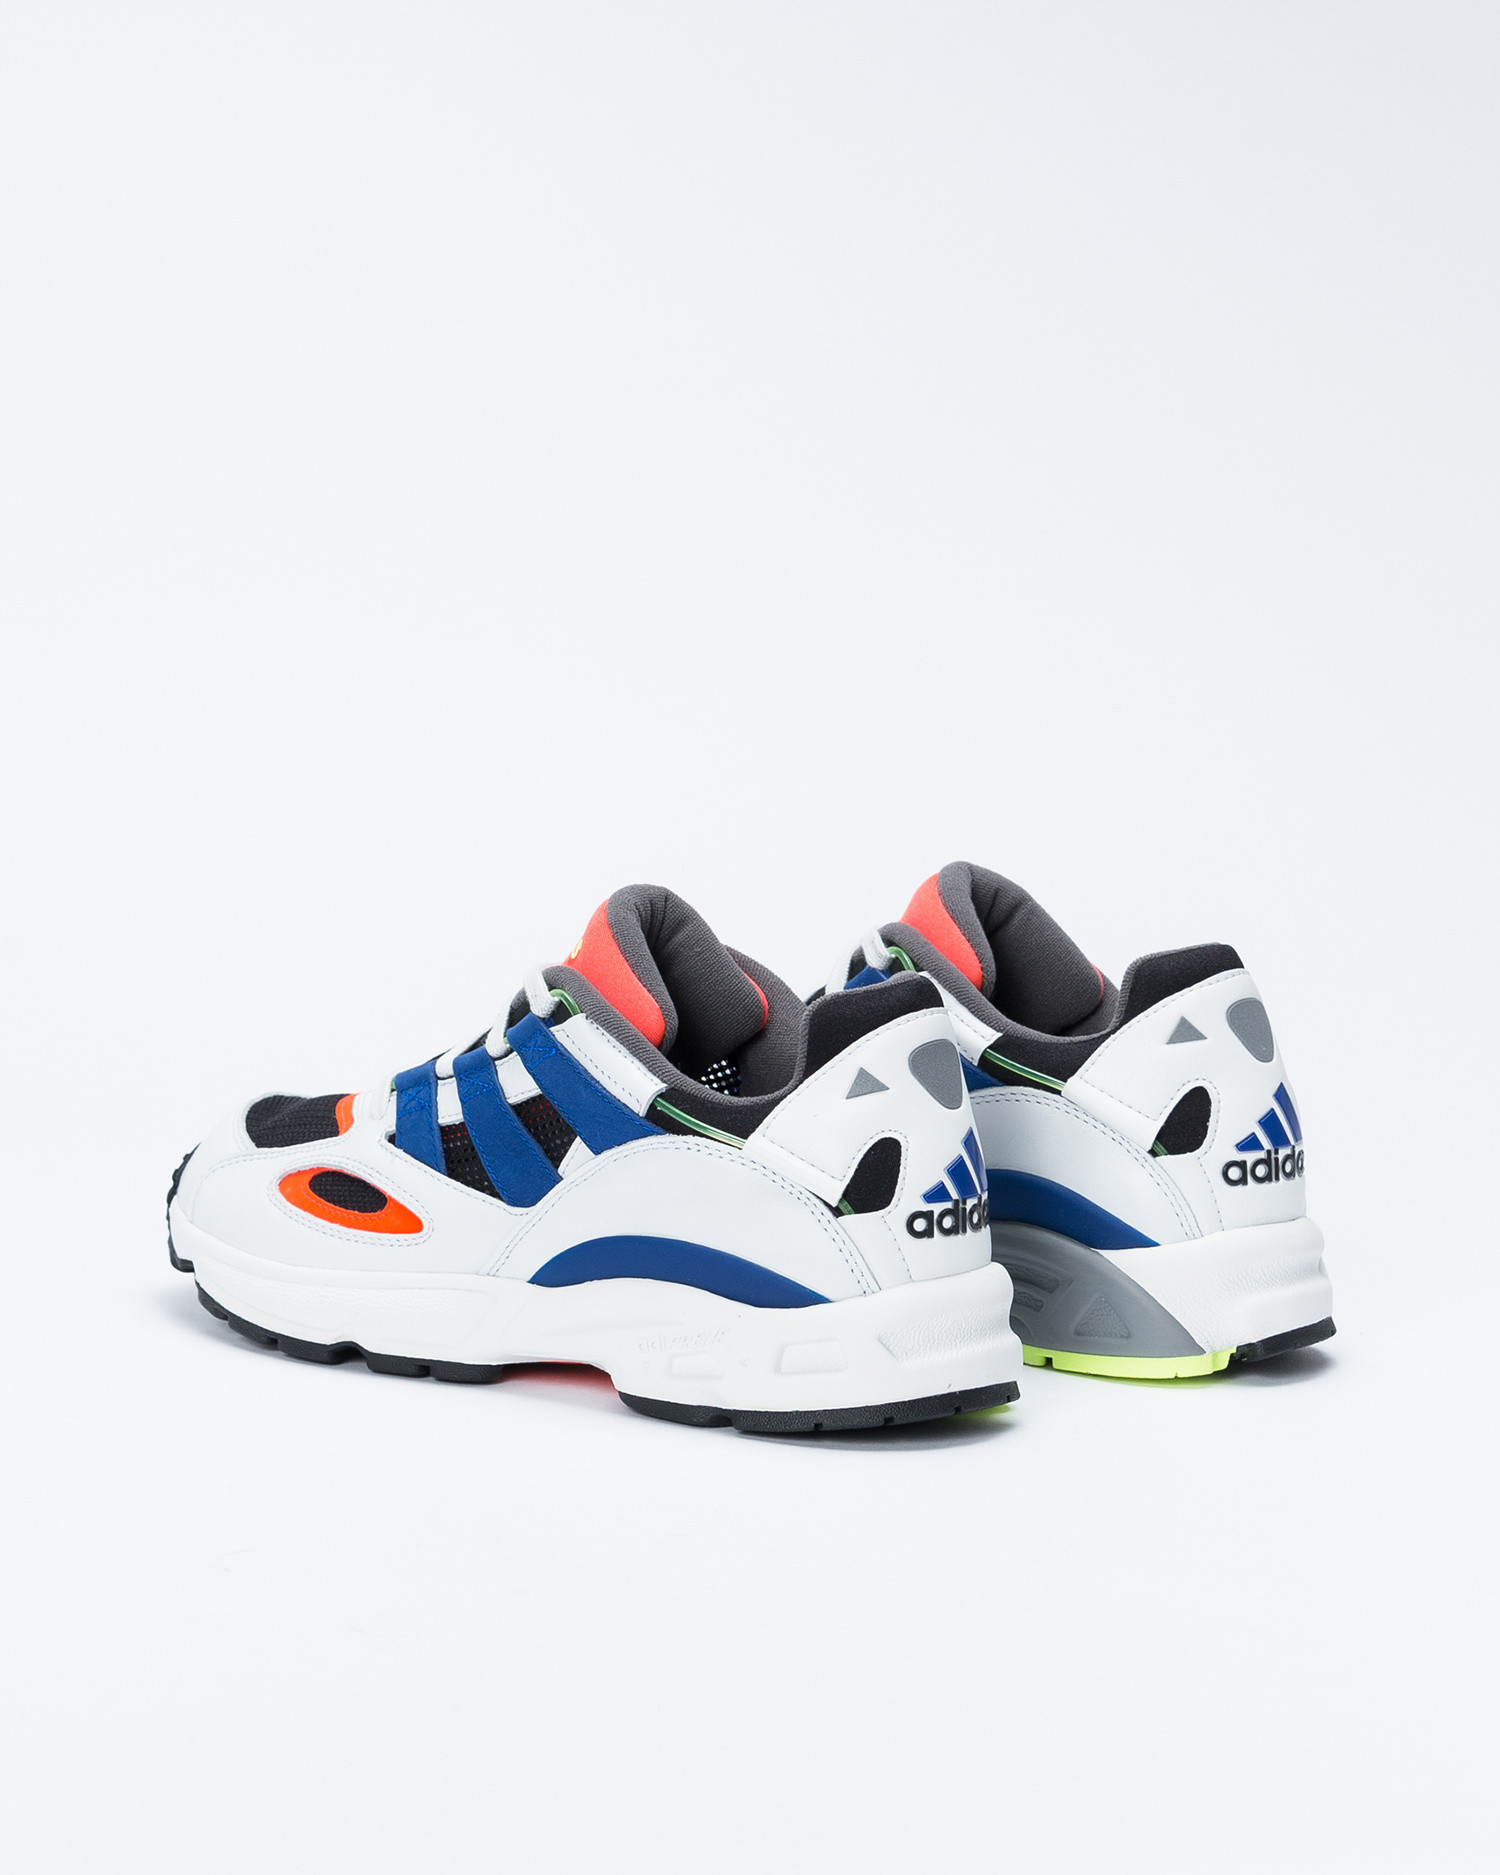 adidas Lxcon 94 crywht/croyal/hireye